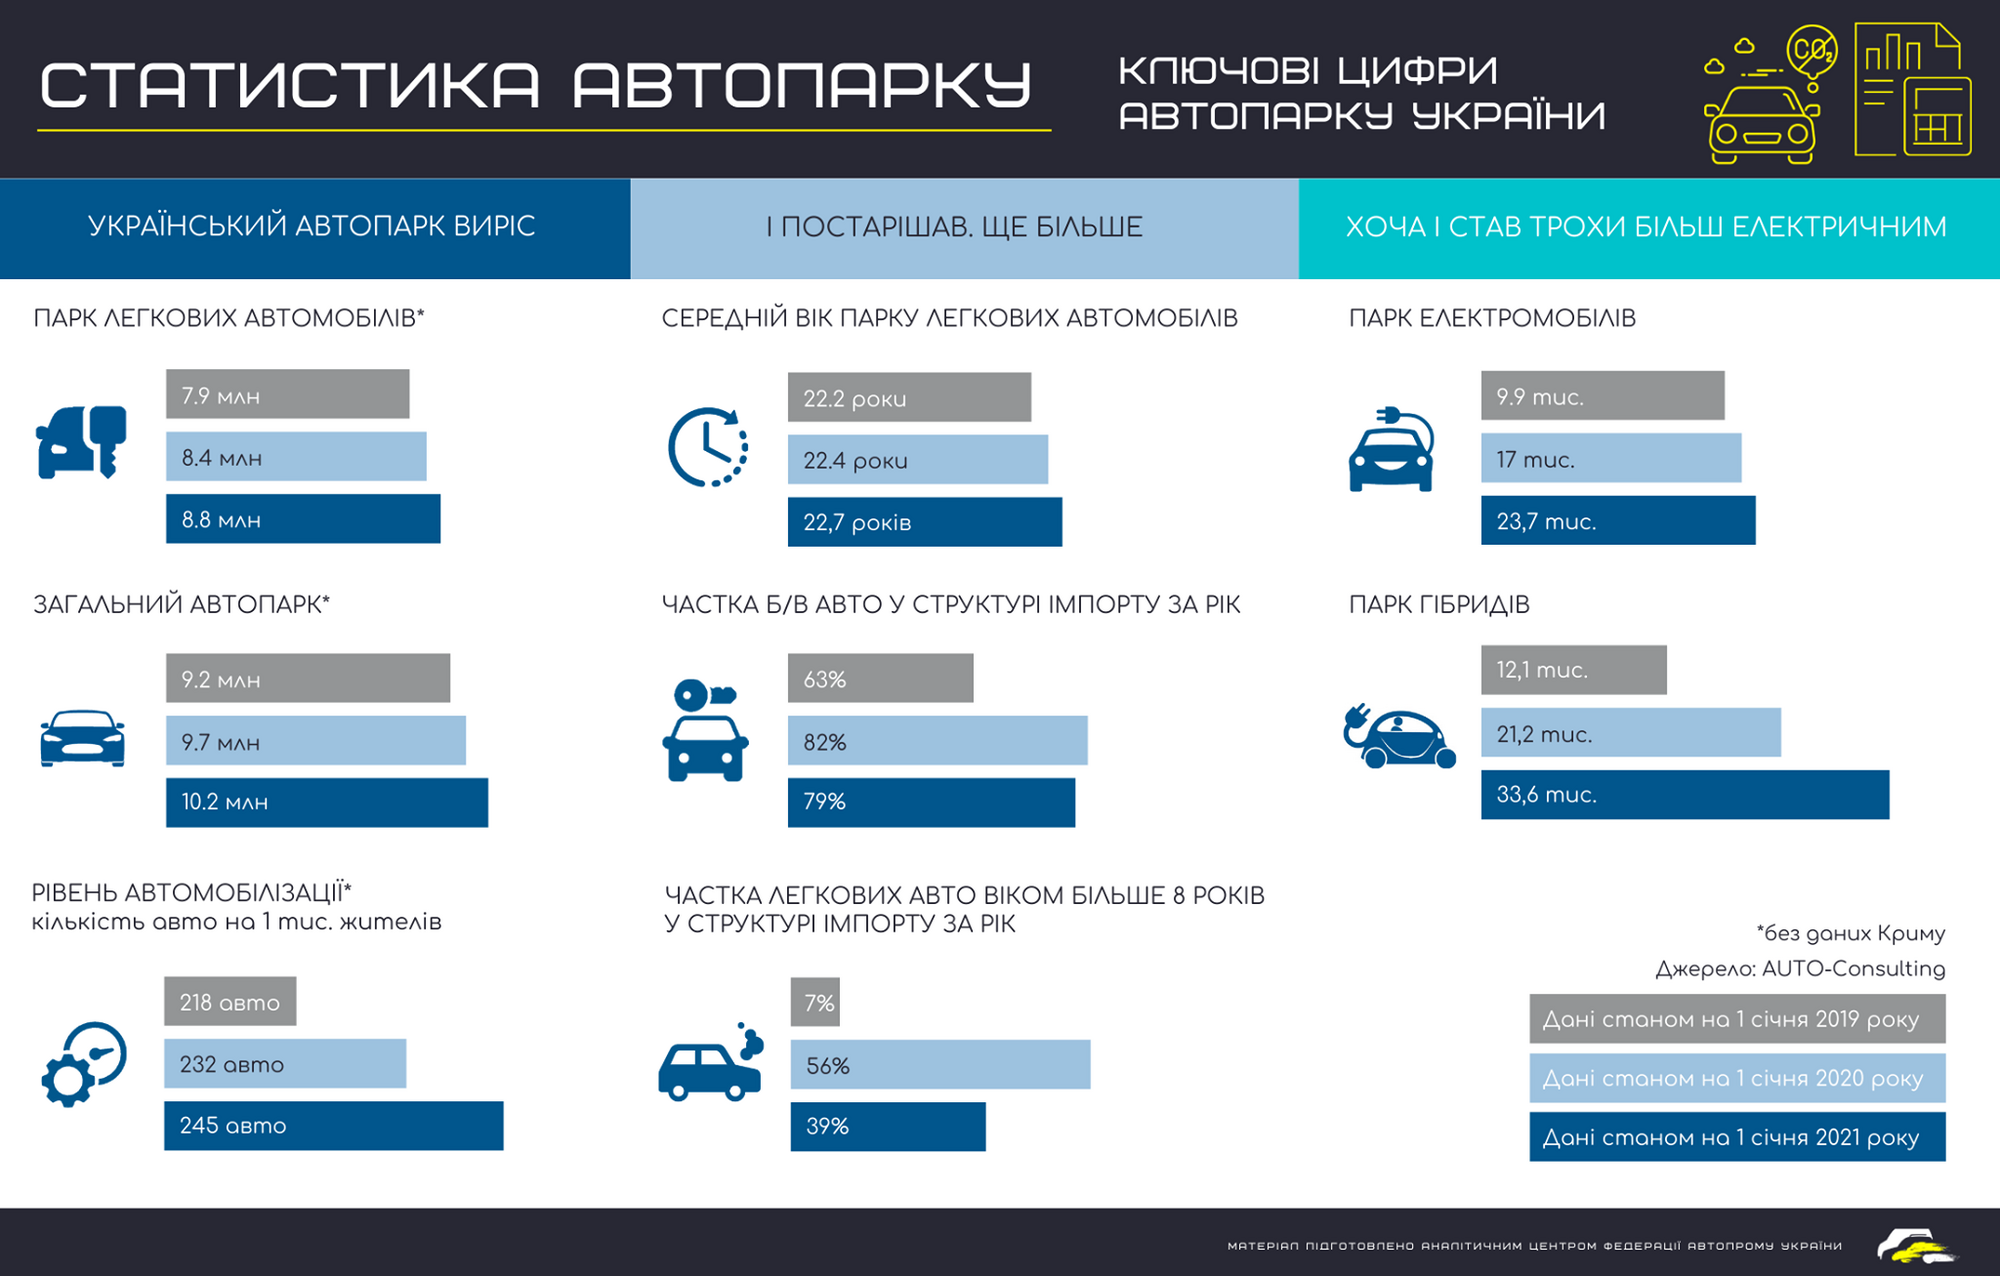 Статистика автопарка Украины по состоянию на начало 2021